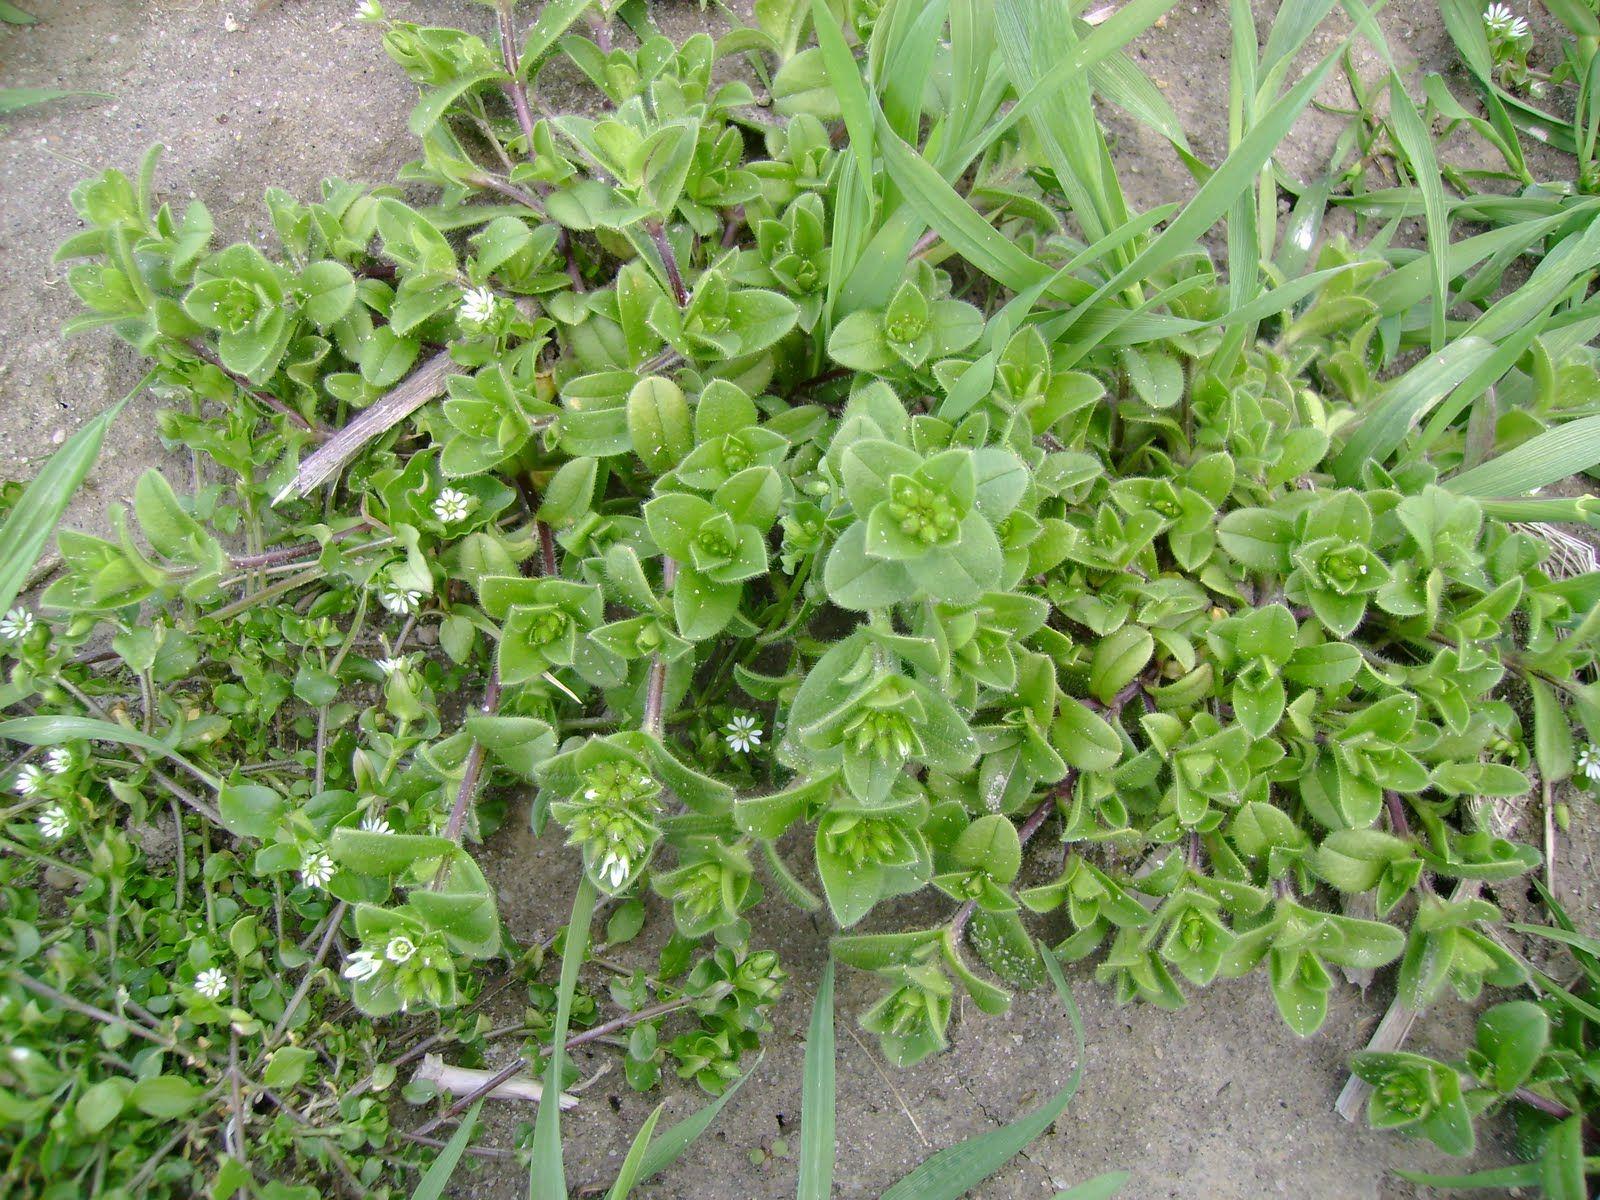 Weeds in flower beds identify - Weeds In Flower Beds Identify 44